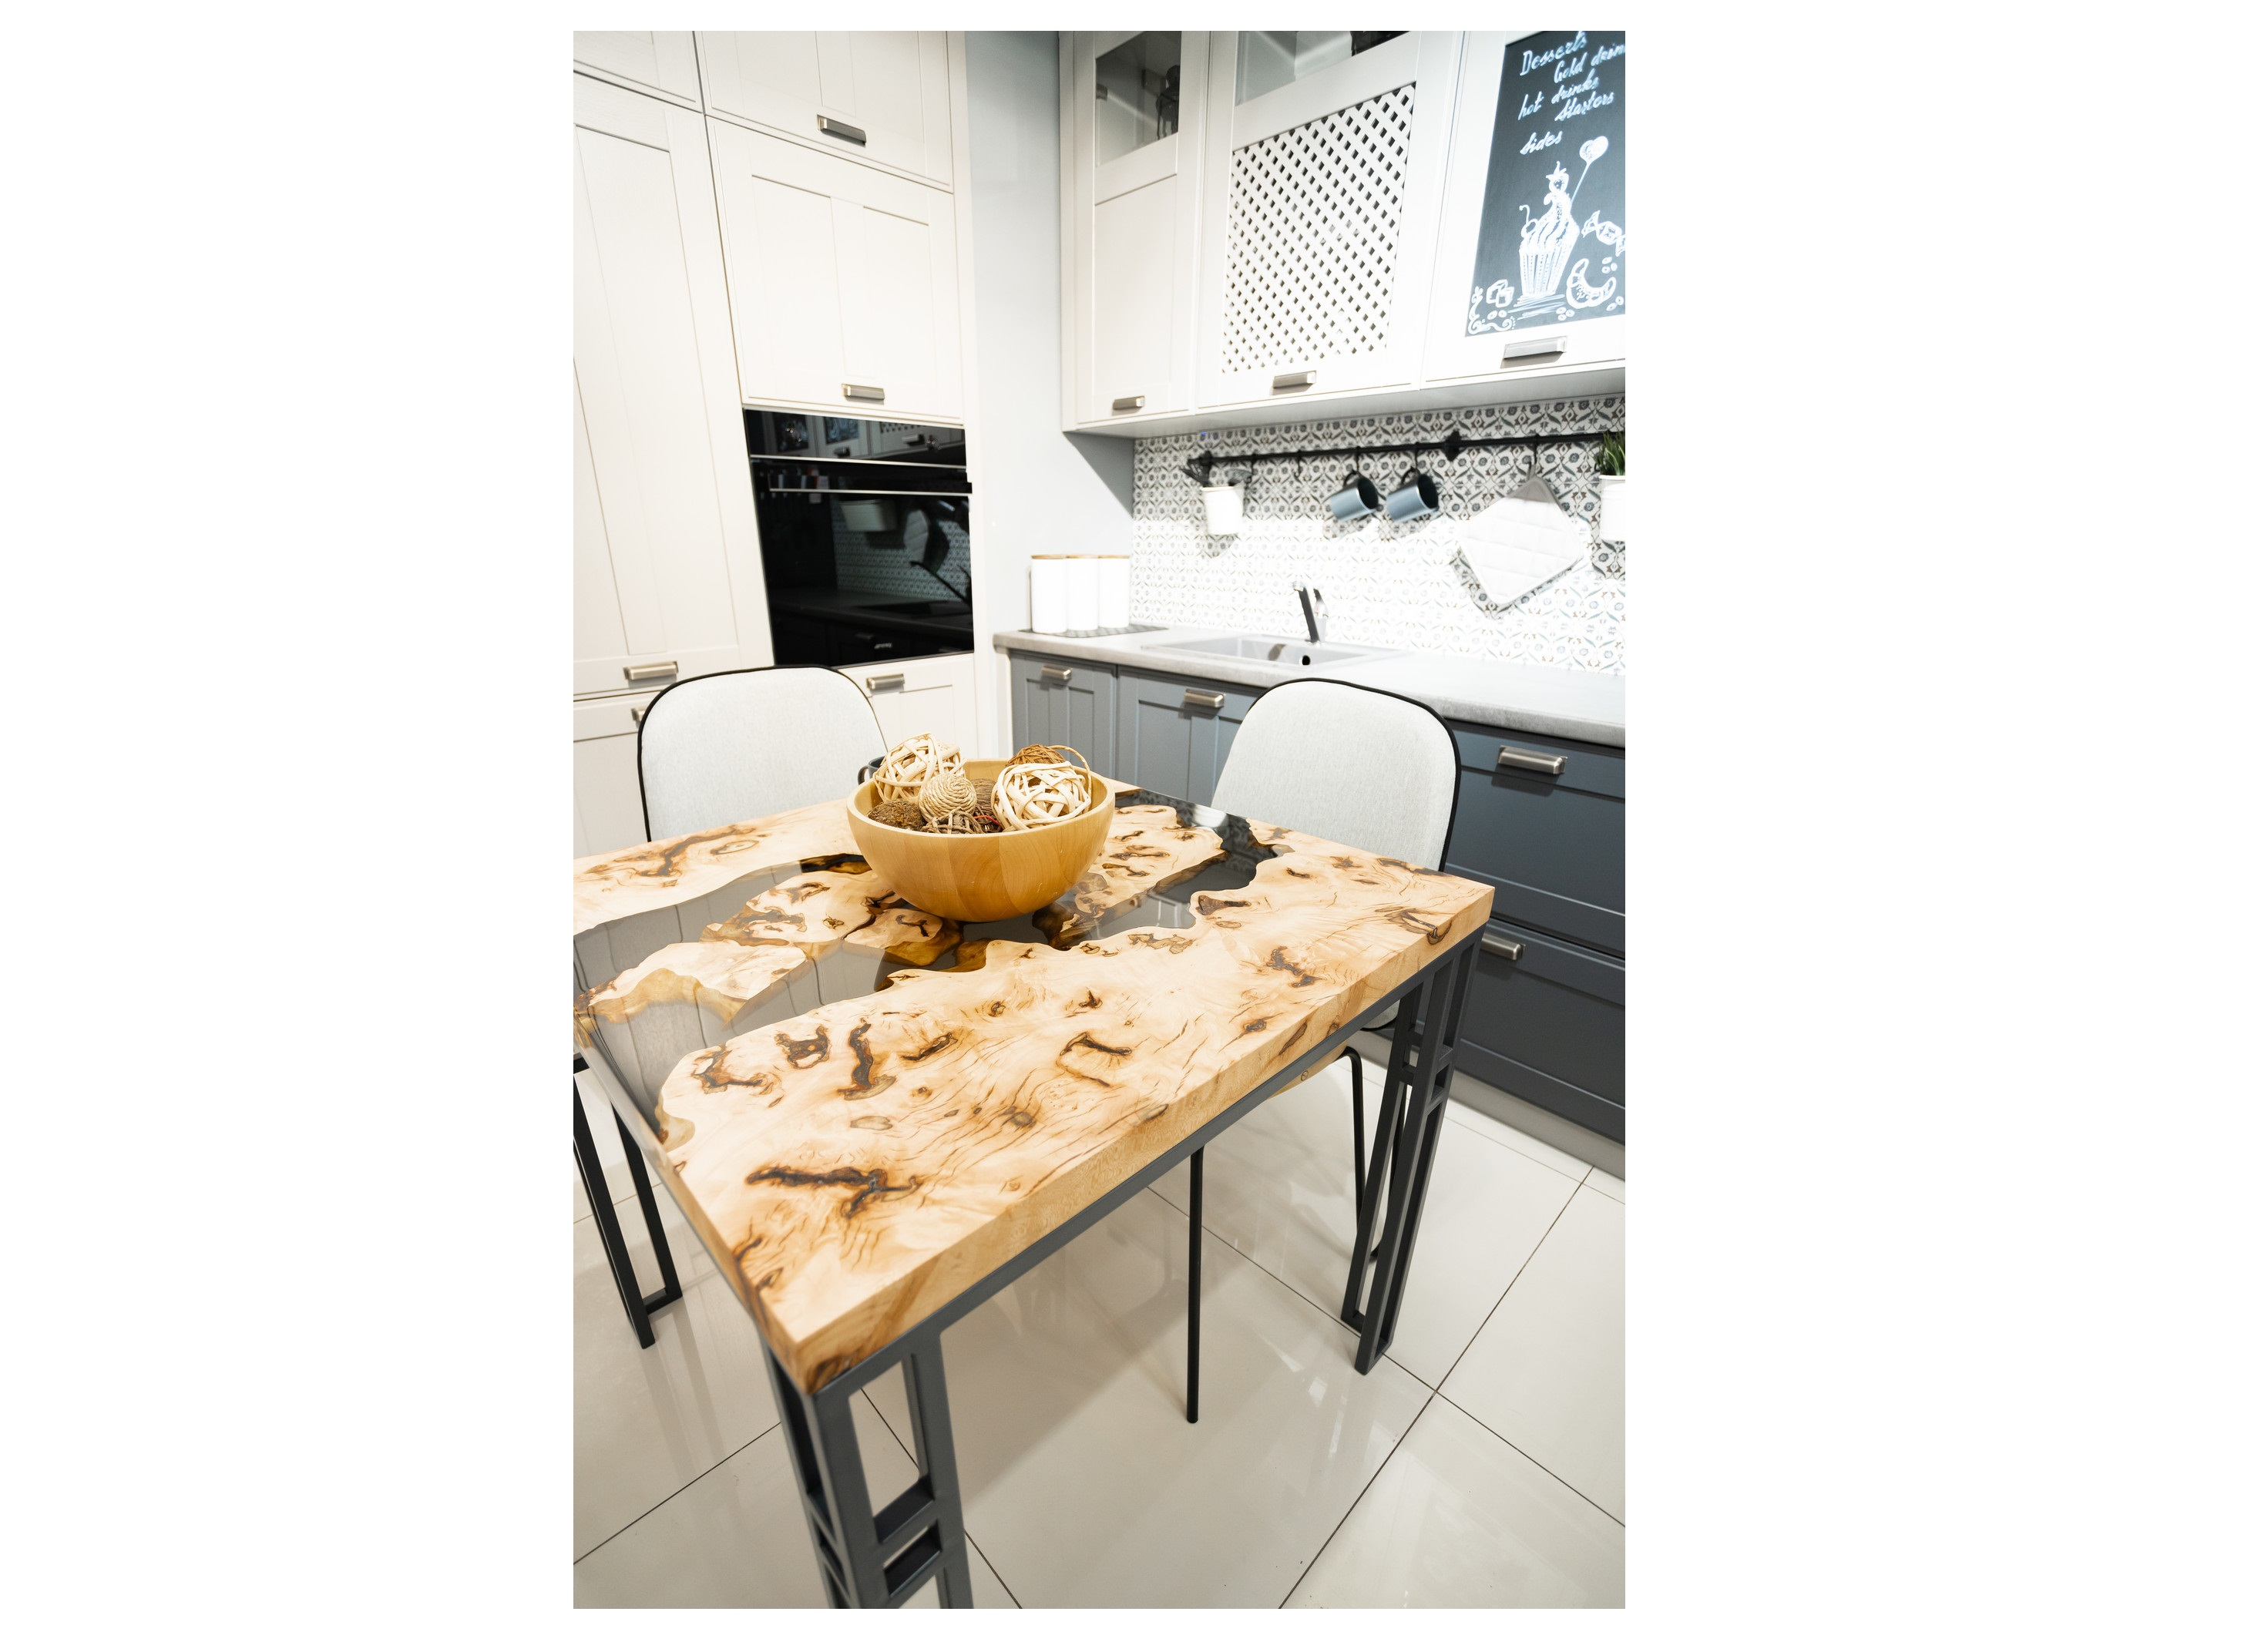 Обеденный стол (woodzpro) коричневый 85x75x85 см.